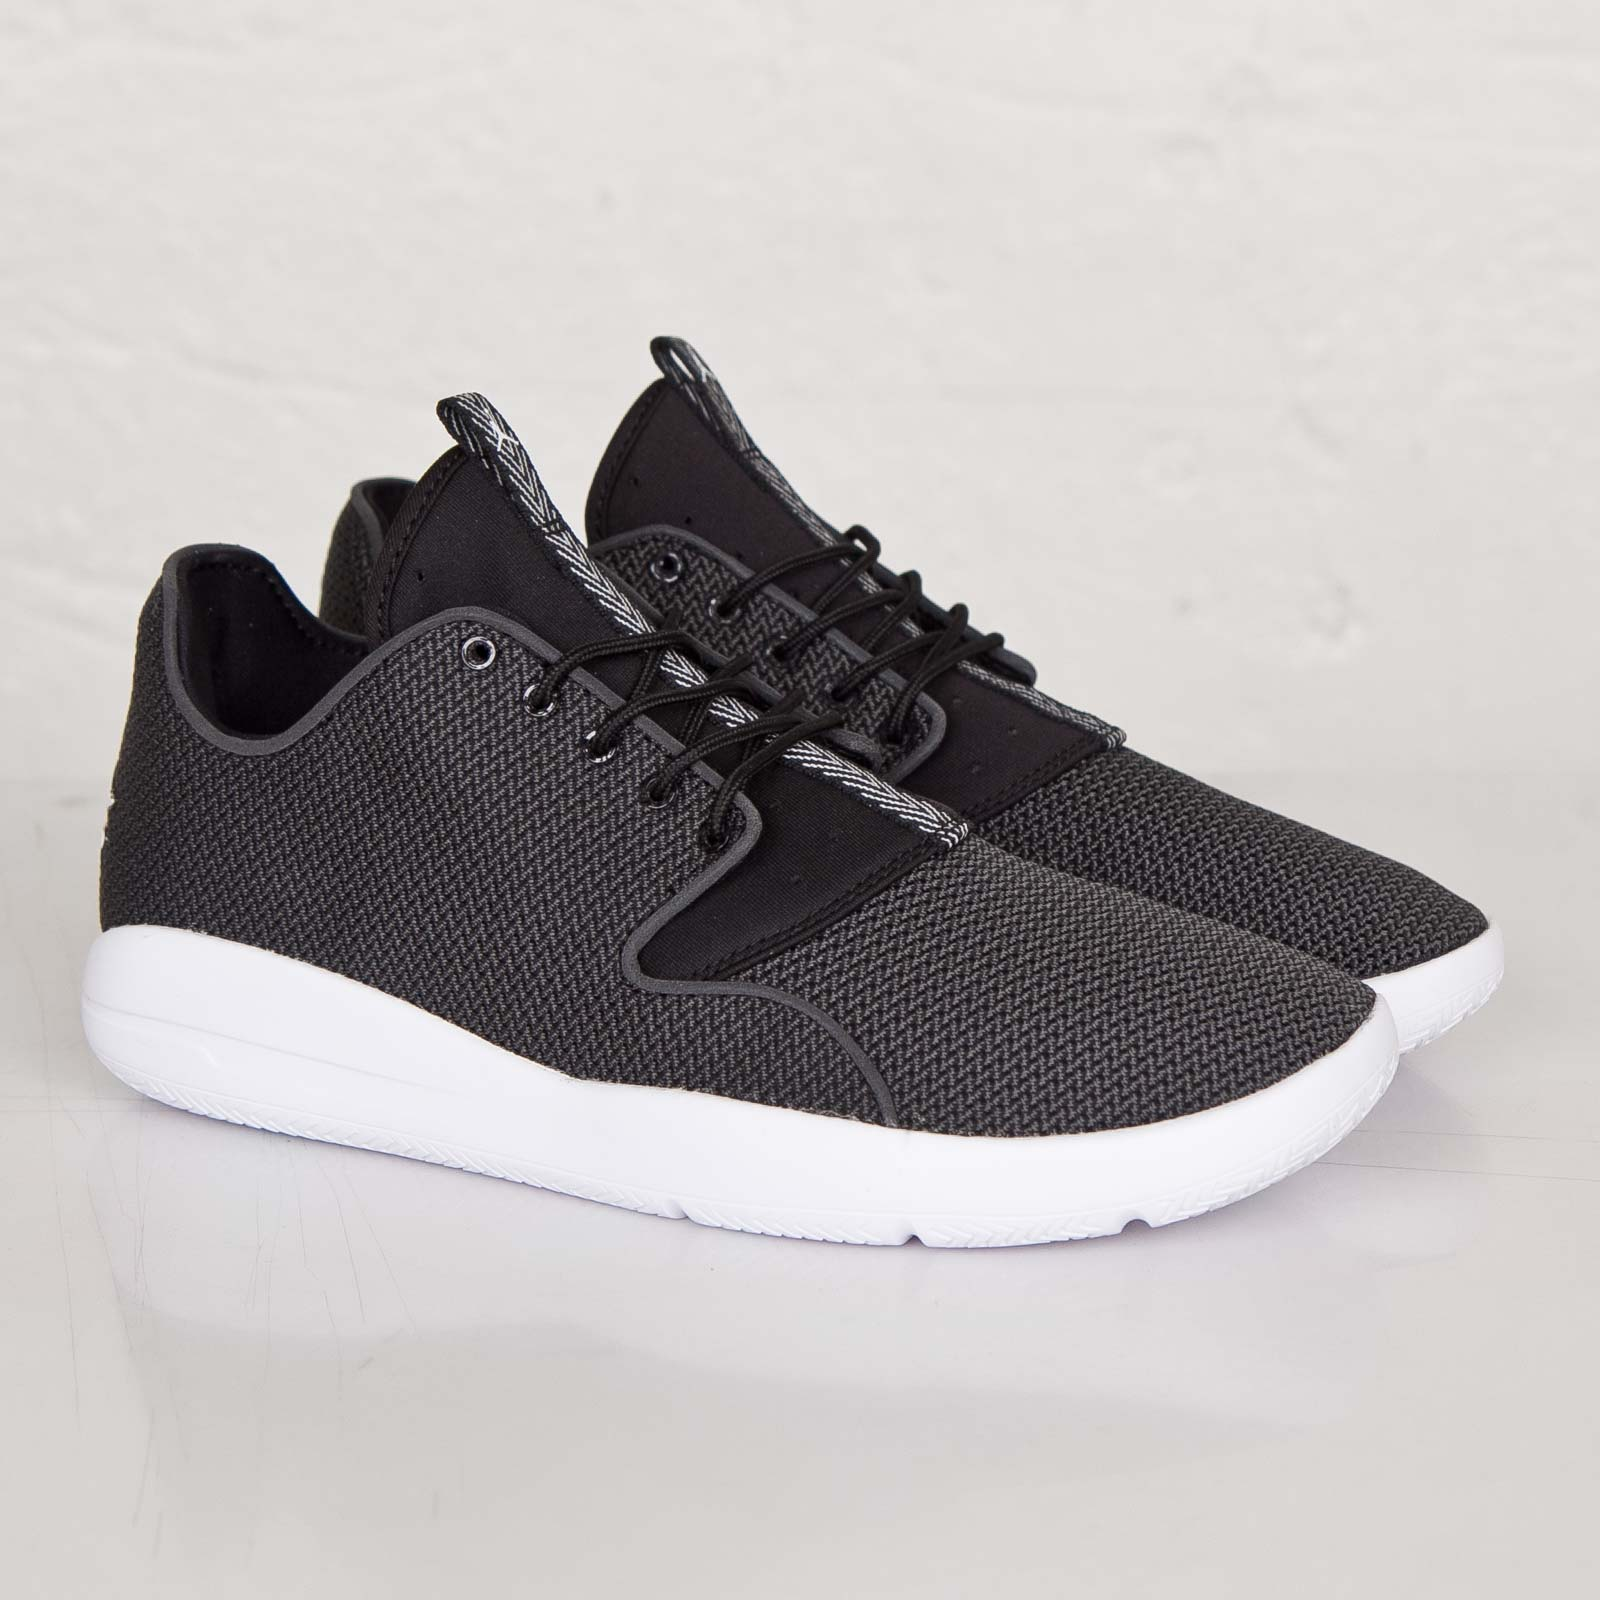 71938b102 Jordan Brand Jordan Eclipse - 724010-010 - Sneakersnstuff